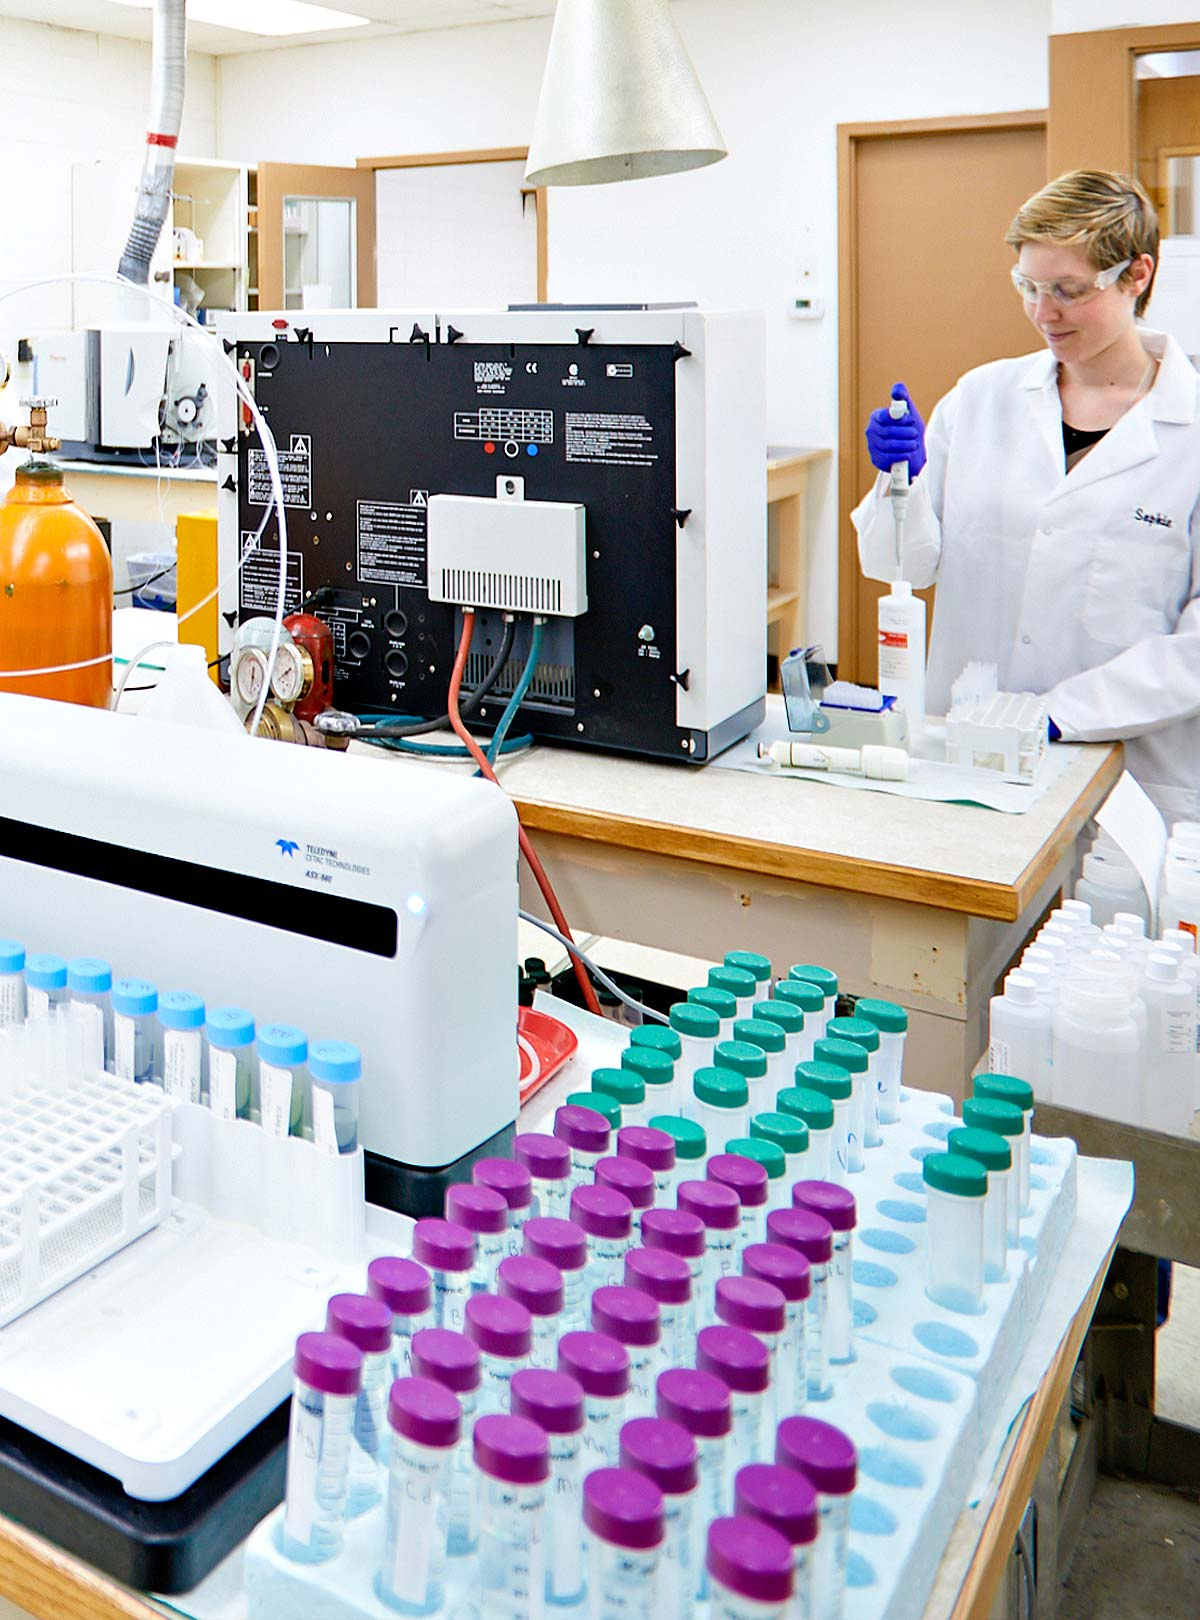 Workers at SVL prepare samples in lab